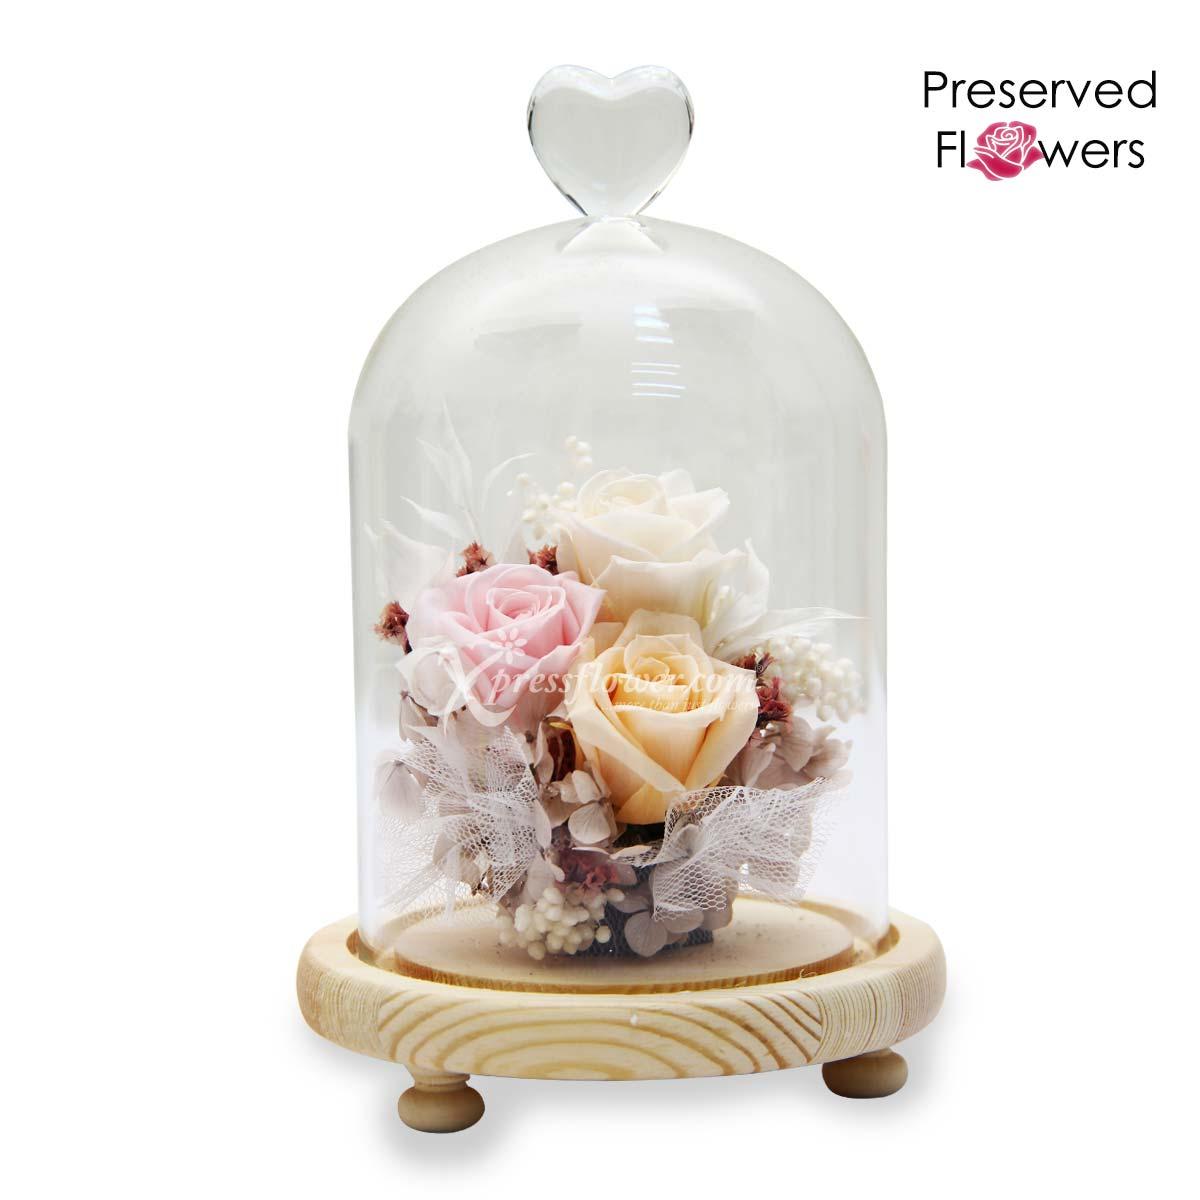 PR2105 Pastel Kisses Preserved Flowers